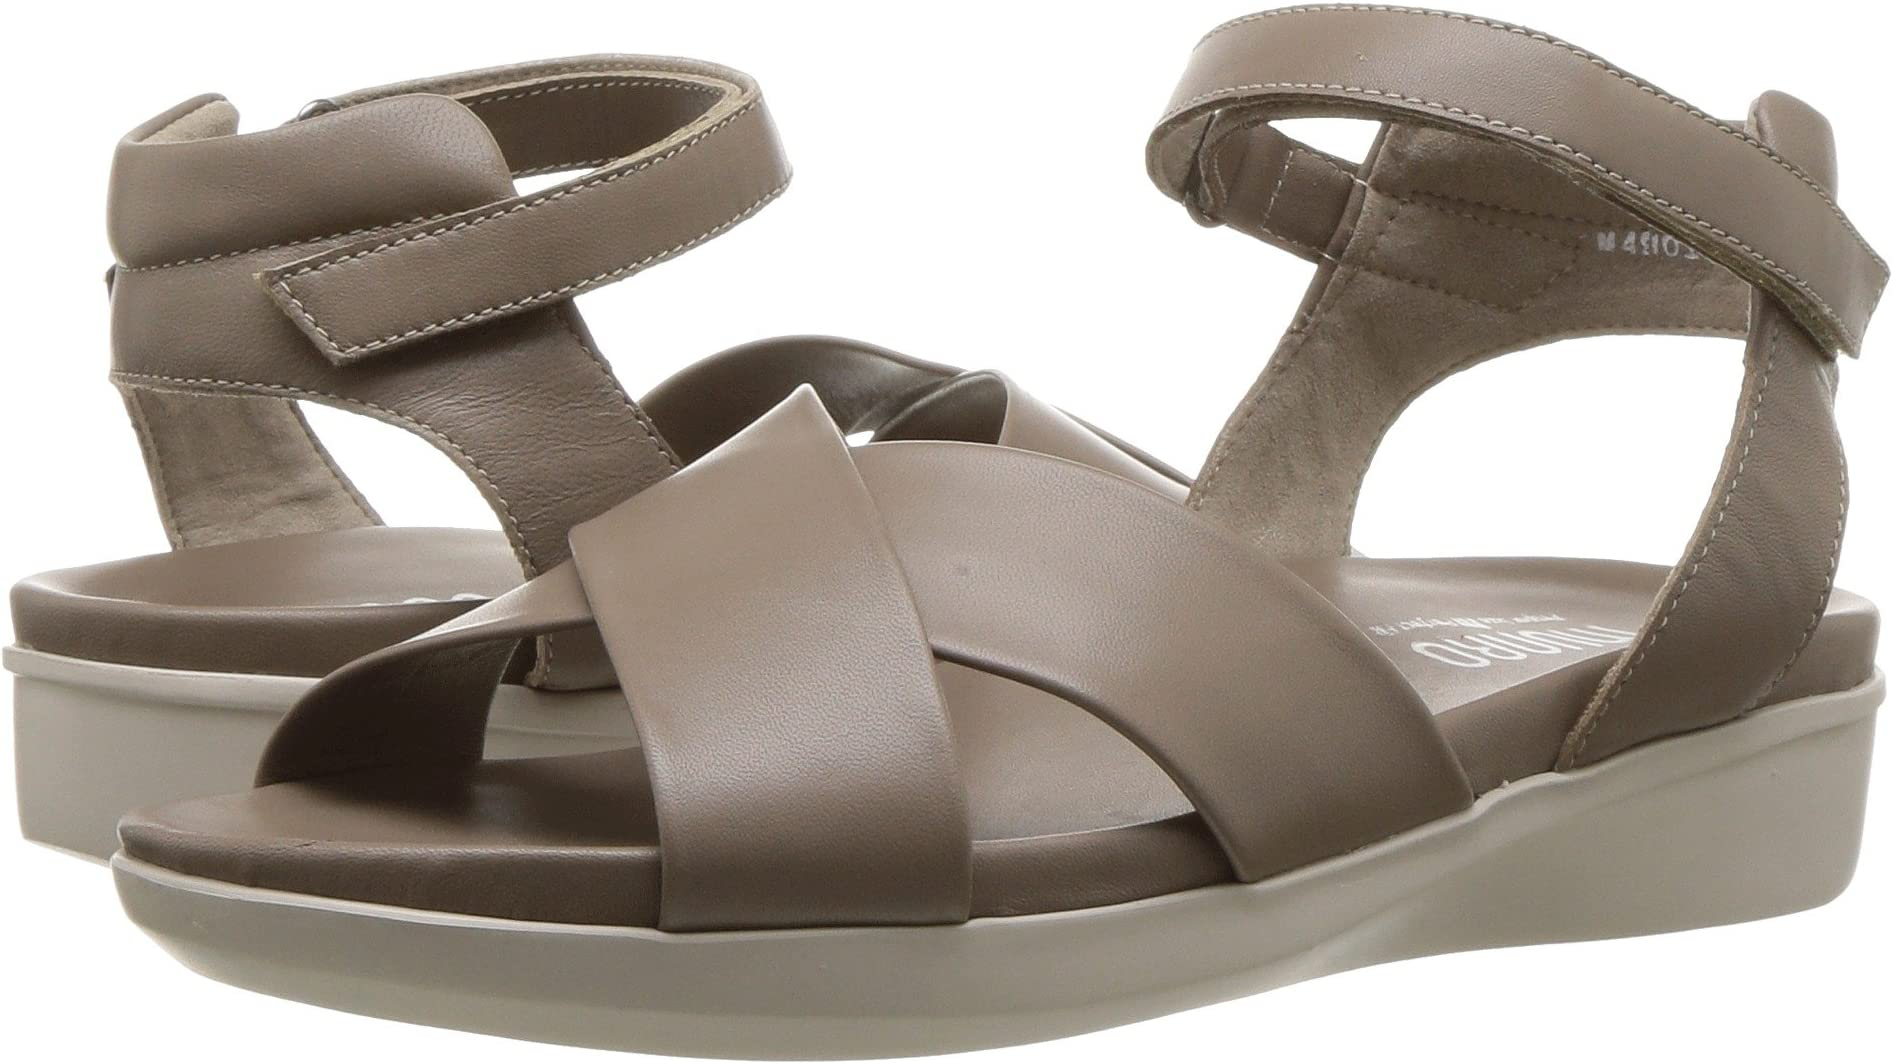 TC-1-Sandals-2019-04-8